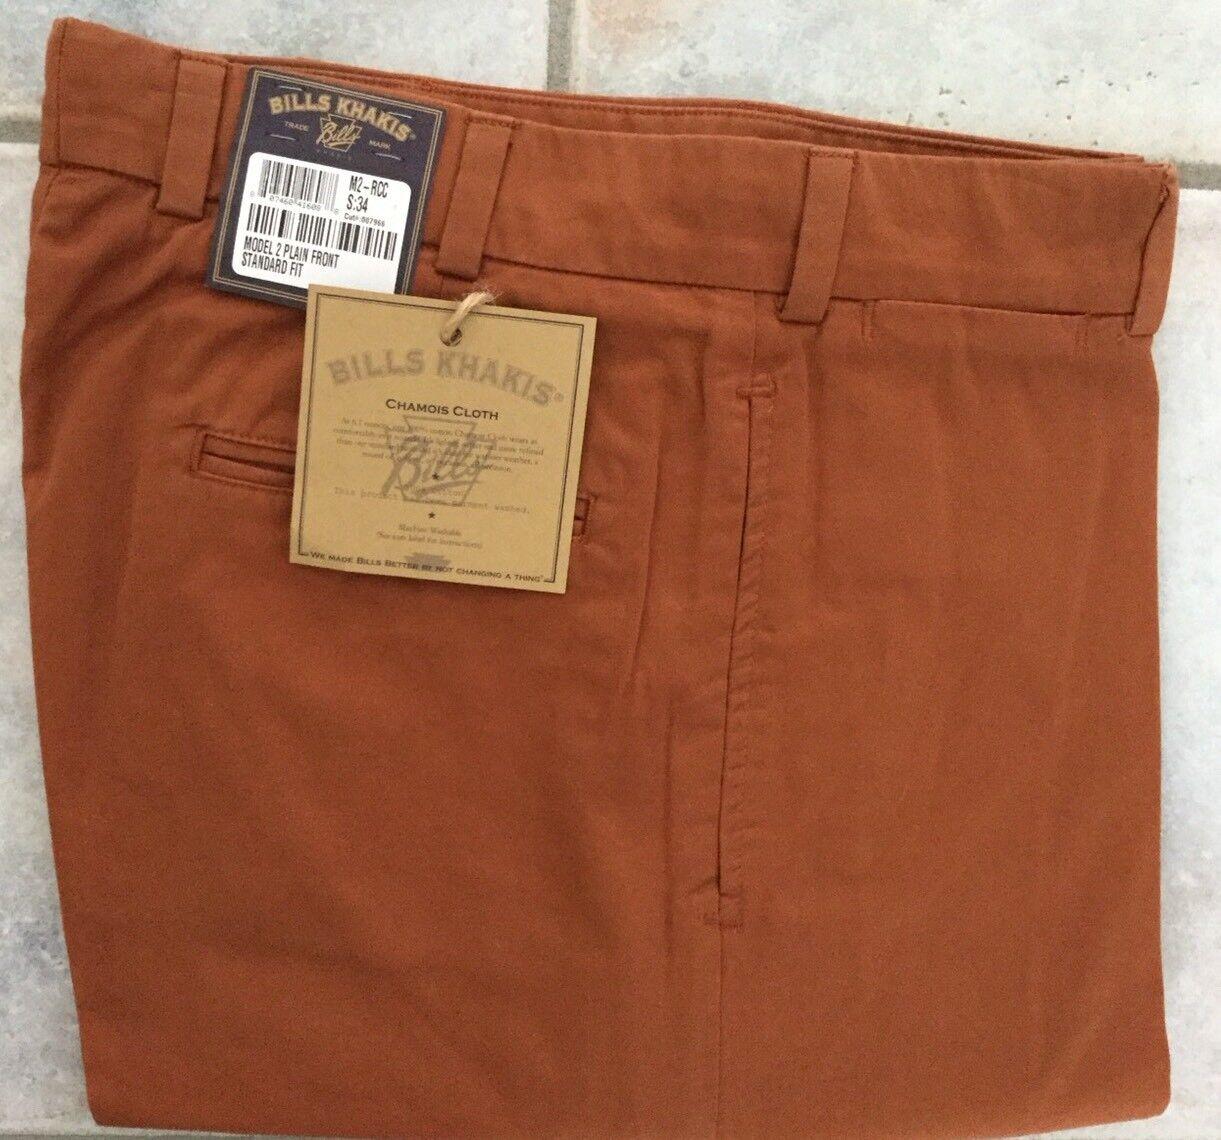 BRAND NEW-Bills khakis M2-RCC Size 34 PLAIN CHAMOIS CLOTH RUST MSRP